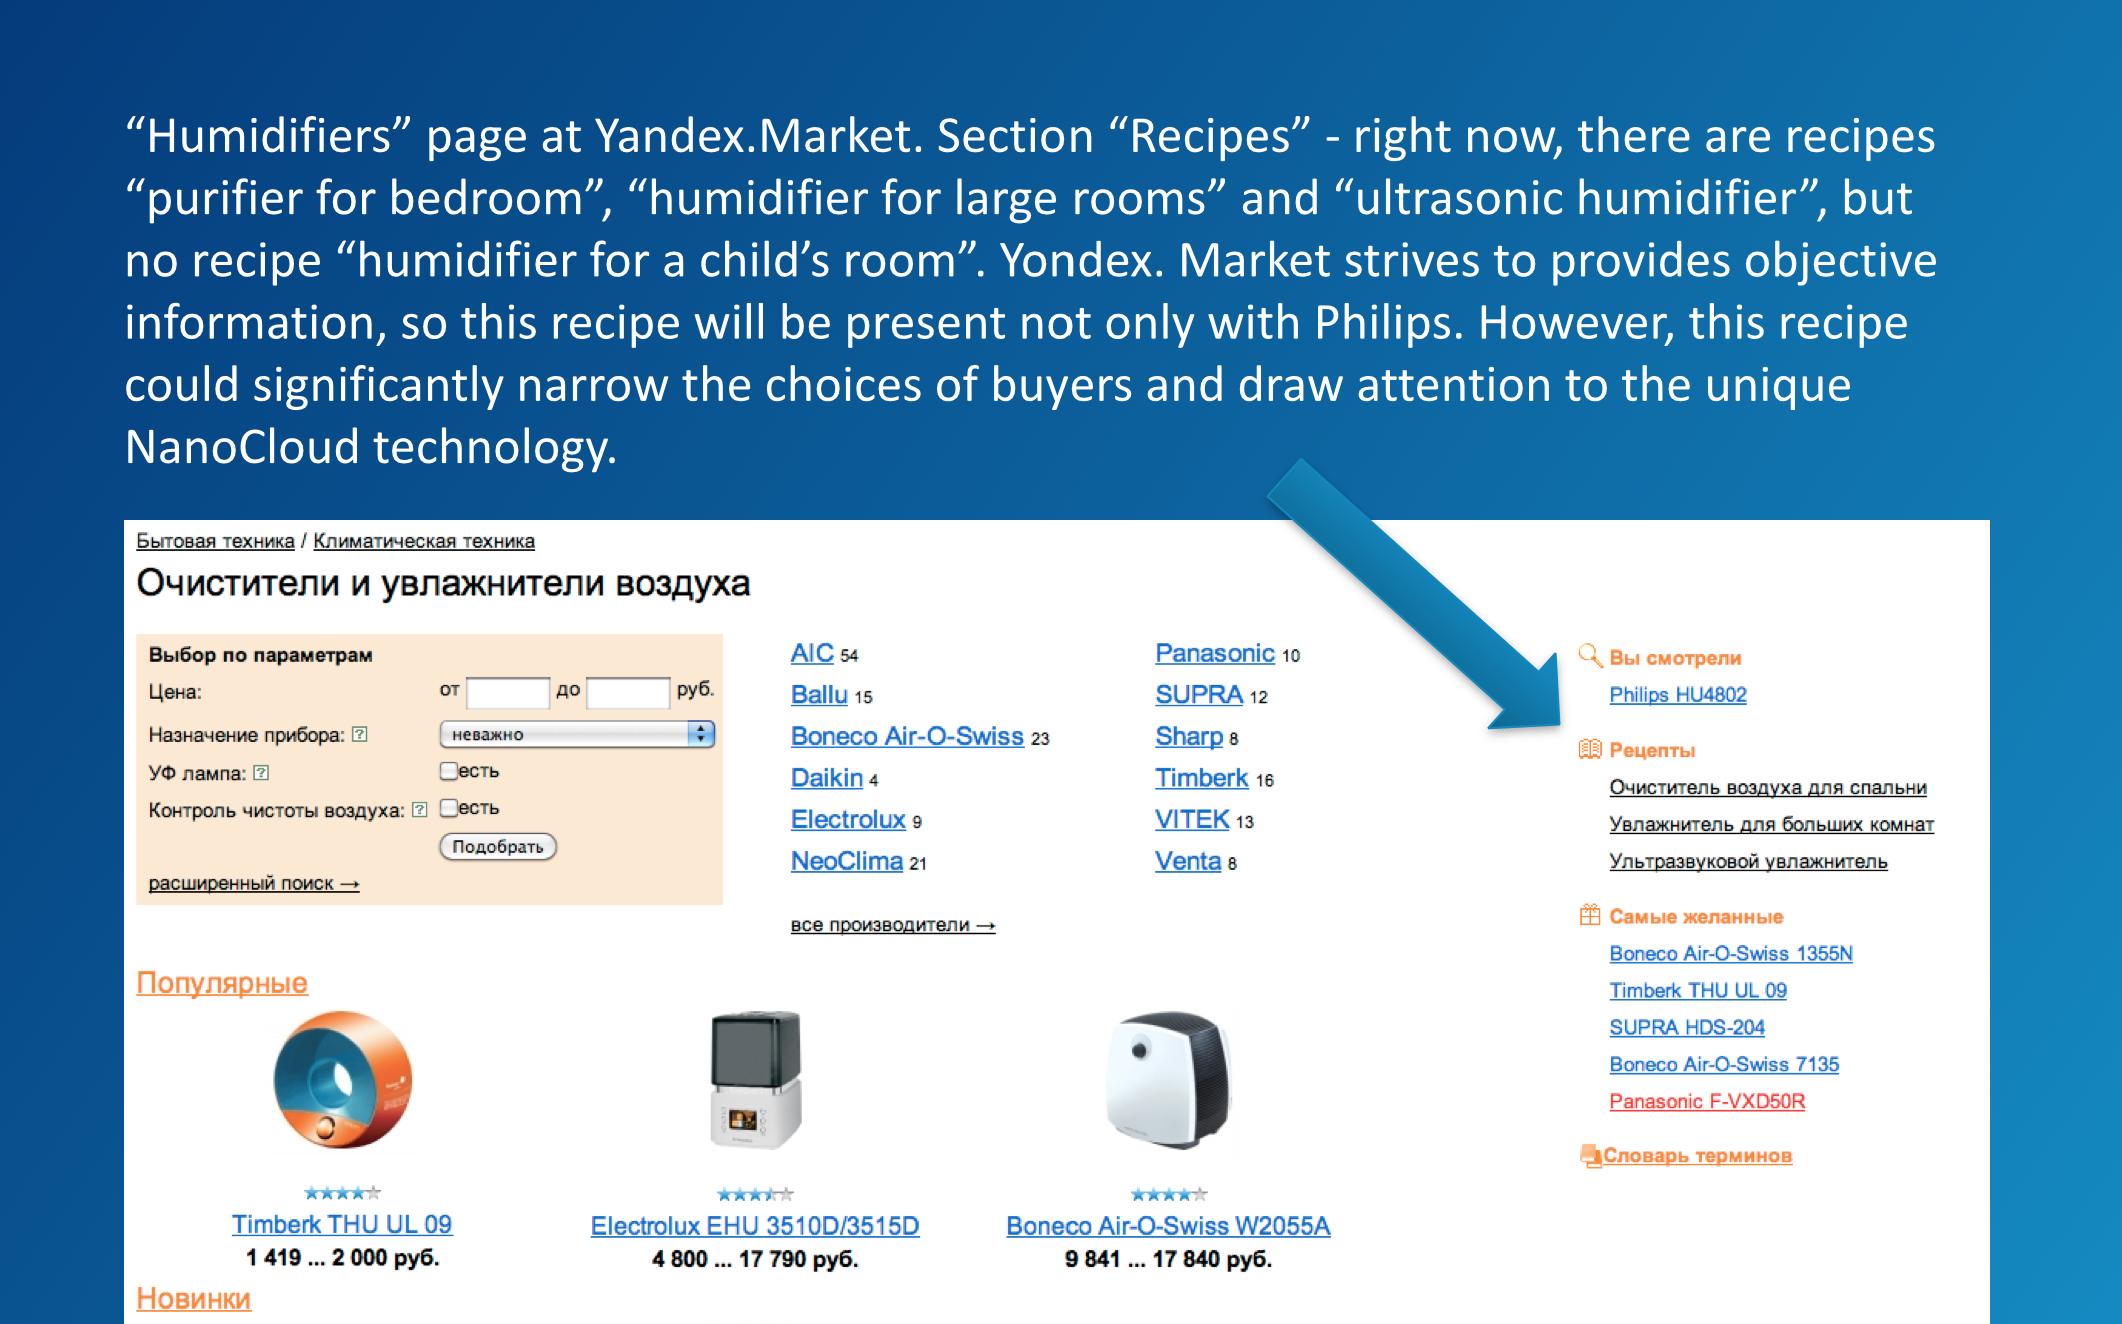 Yandex. Market